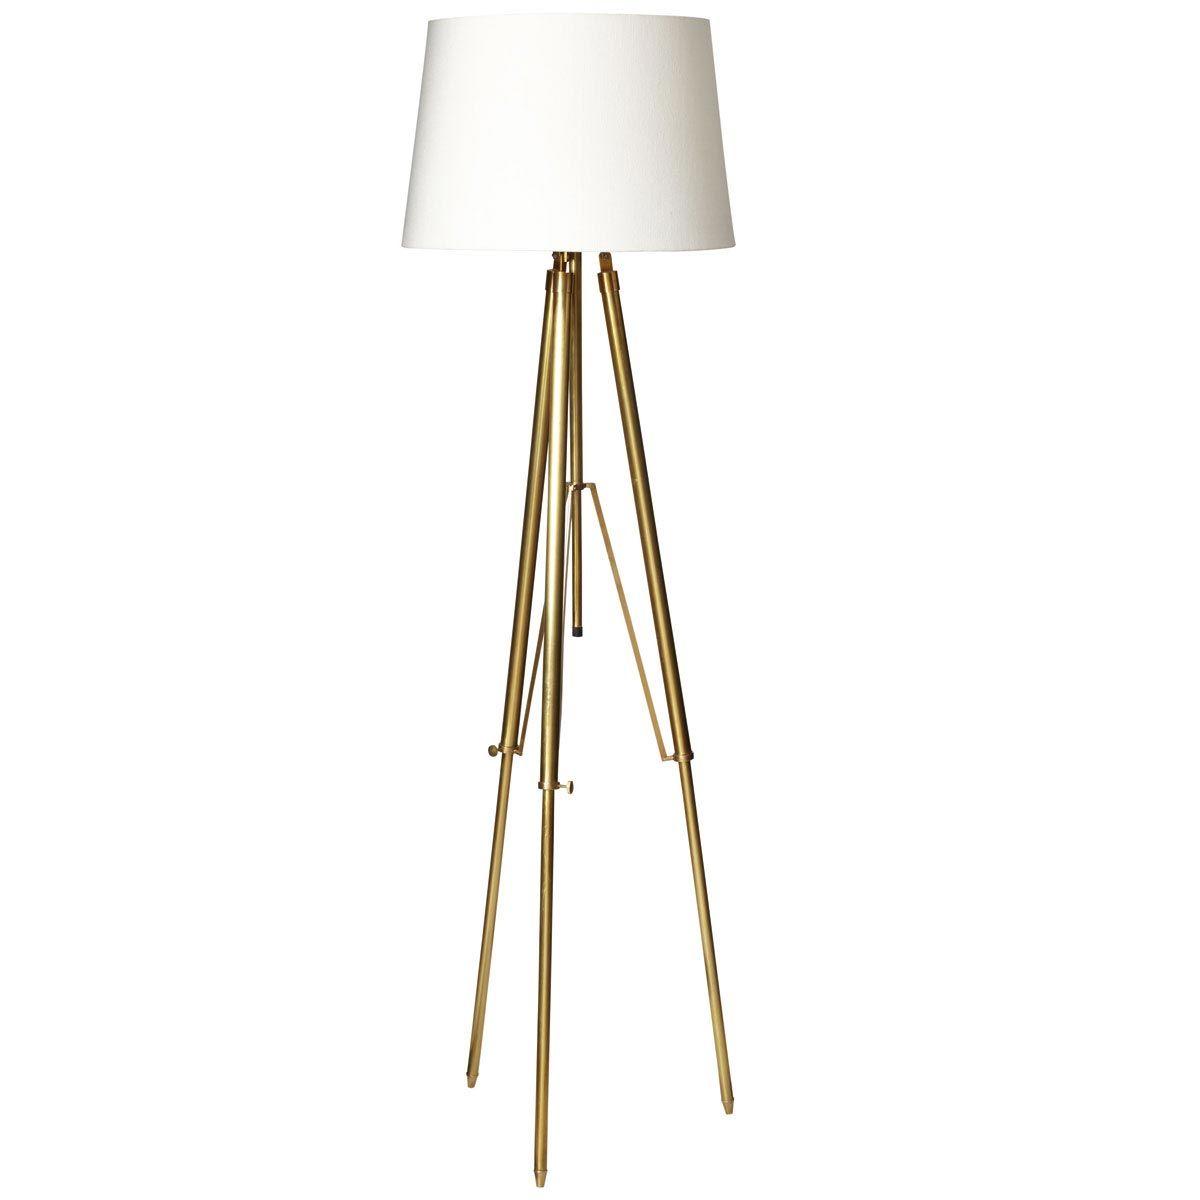 Adjustable Tripod Floor Lamp Brass Chrome Floor Lamps Tripod Lamp Brass Floor Lamp